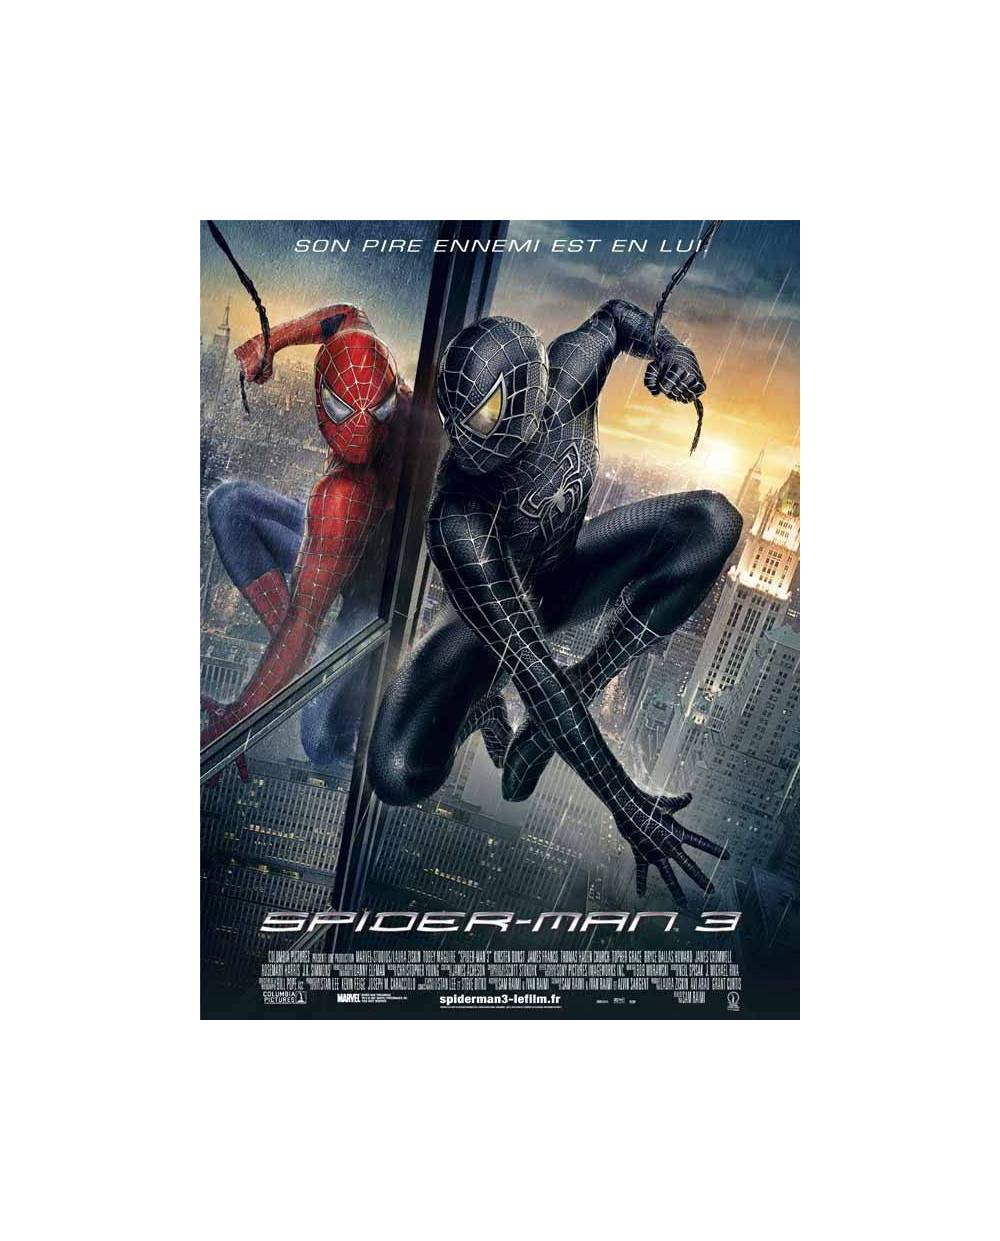 D guisement spiderman noir v nom - Spiderman noir 3 ...